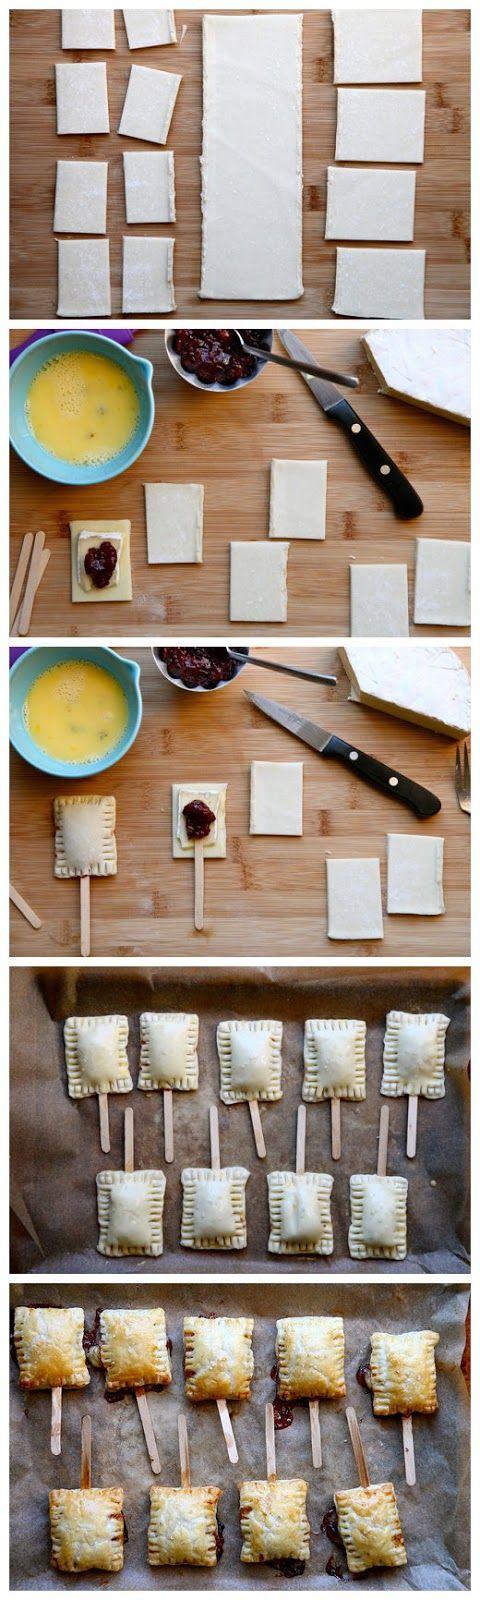 Bite Sized Baked Brie | Mini Bites & Party Food | Pinterest